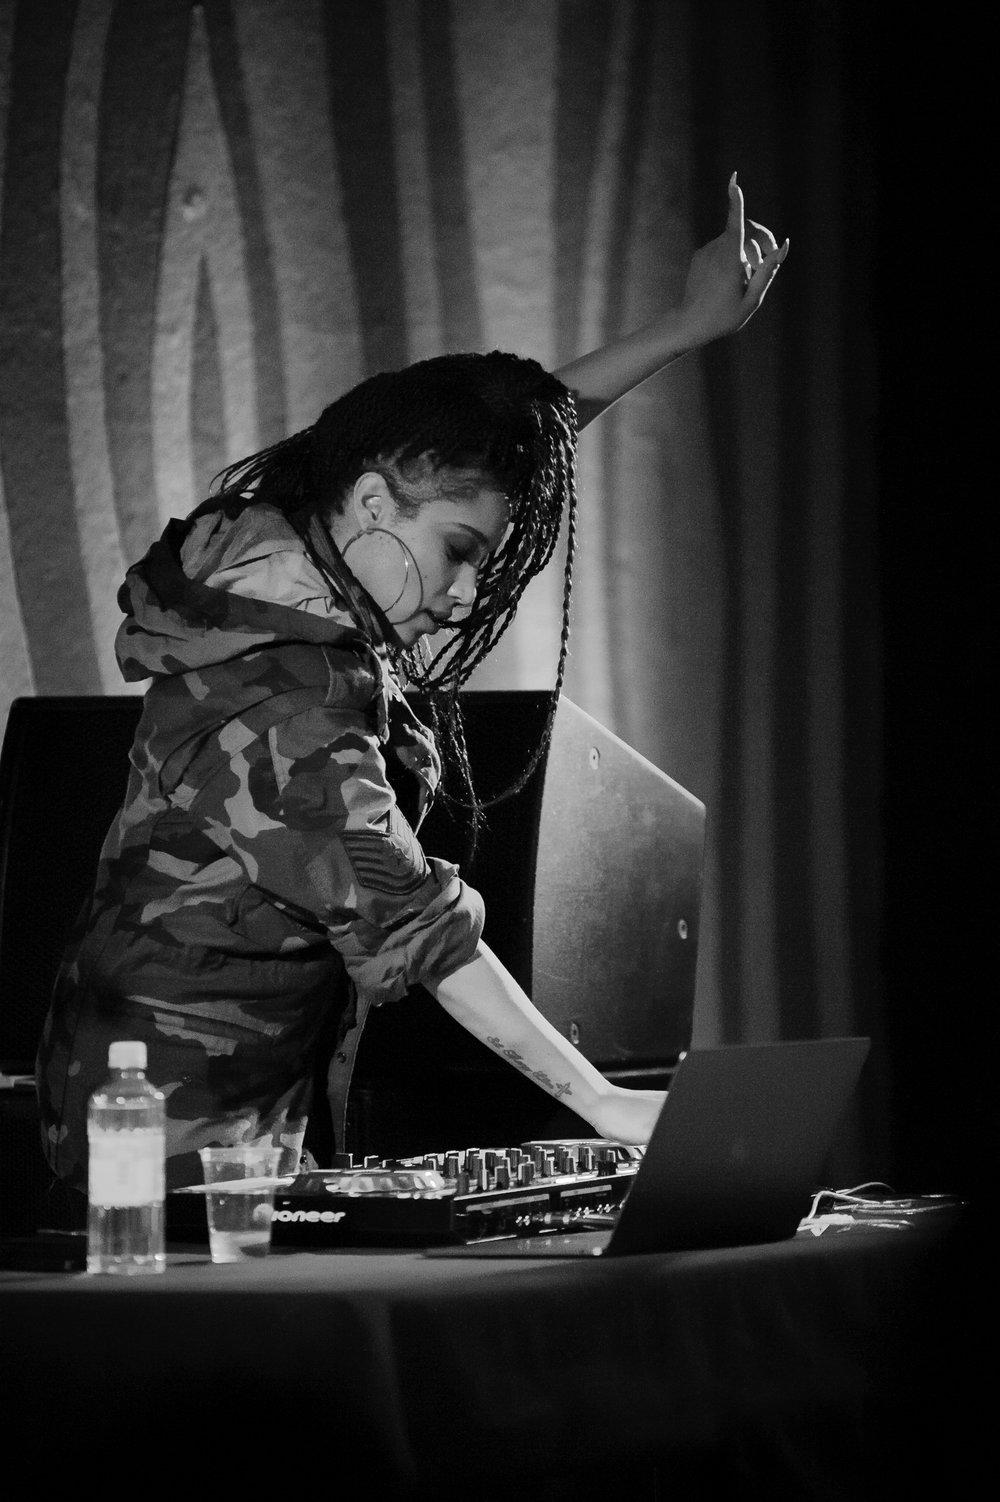 portland-music-photographer-dave-franz-sophia-eris-doug-fir-3.jpg